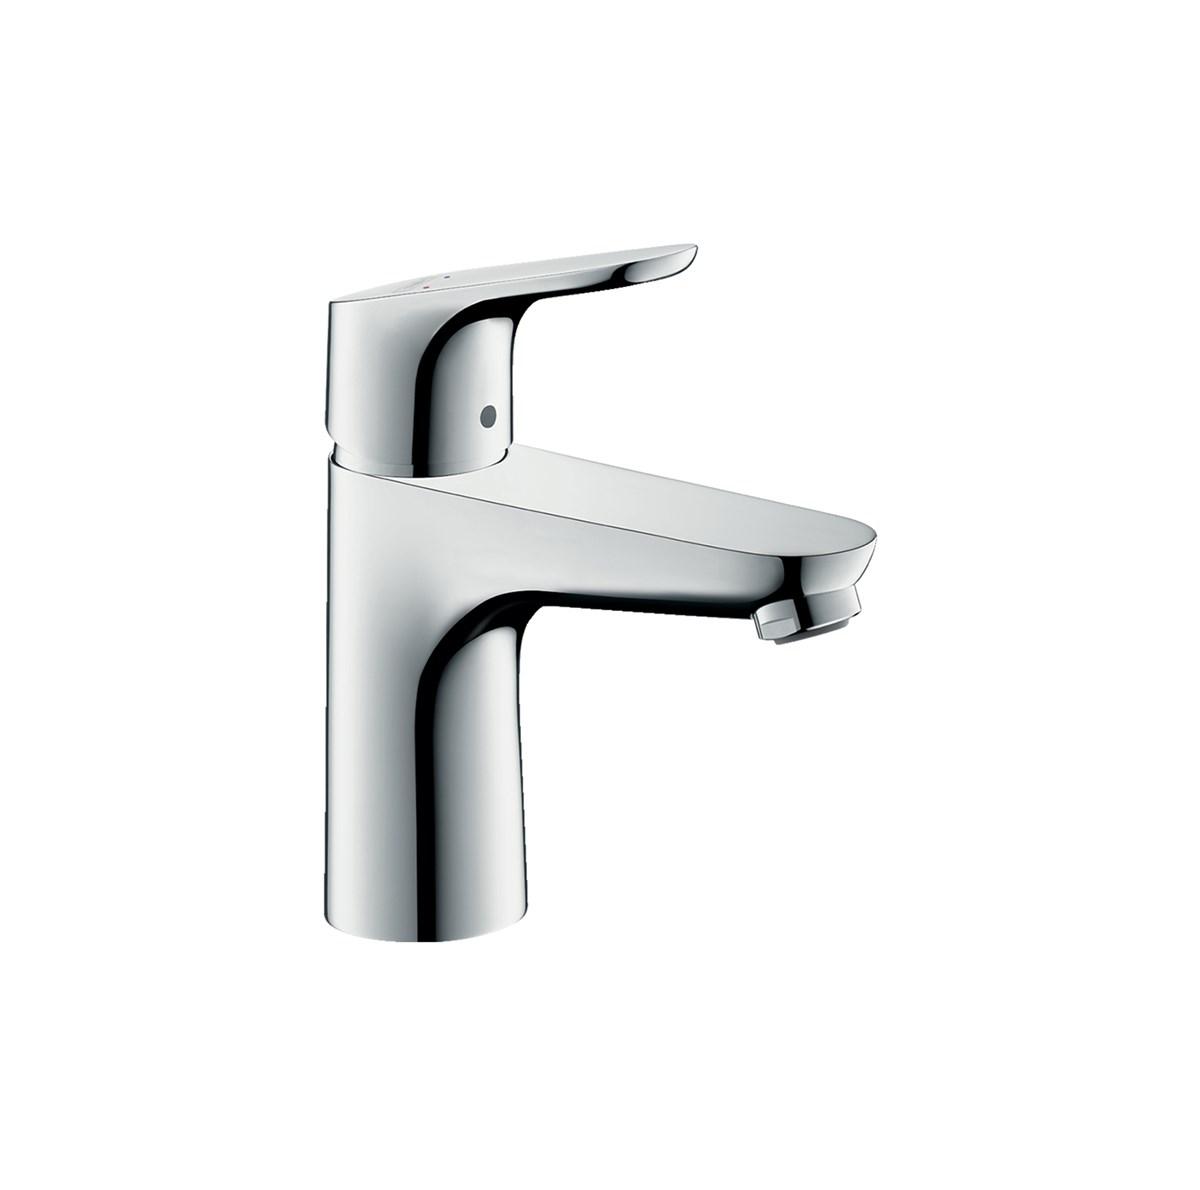 Hansgrohe-Focus-Basin-Mixer-100-31517000-Matisse-1